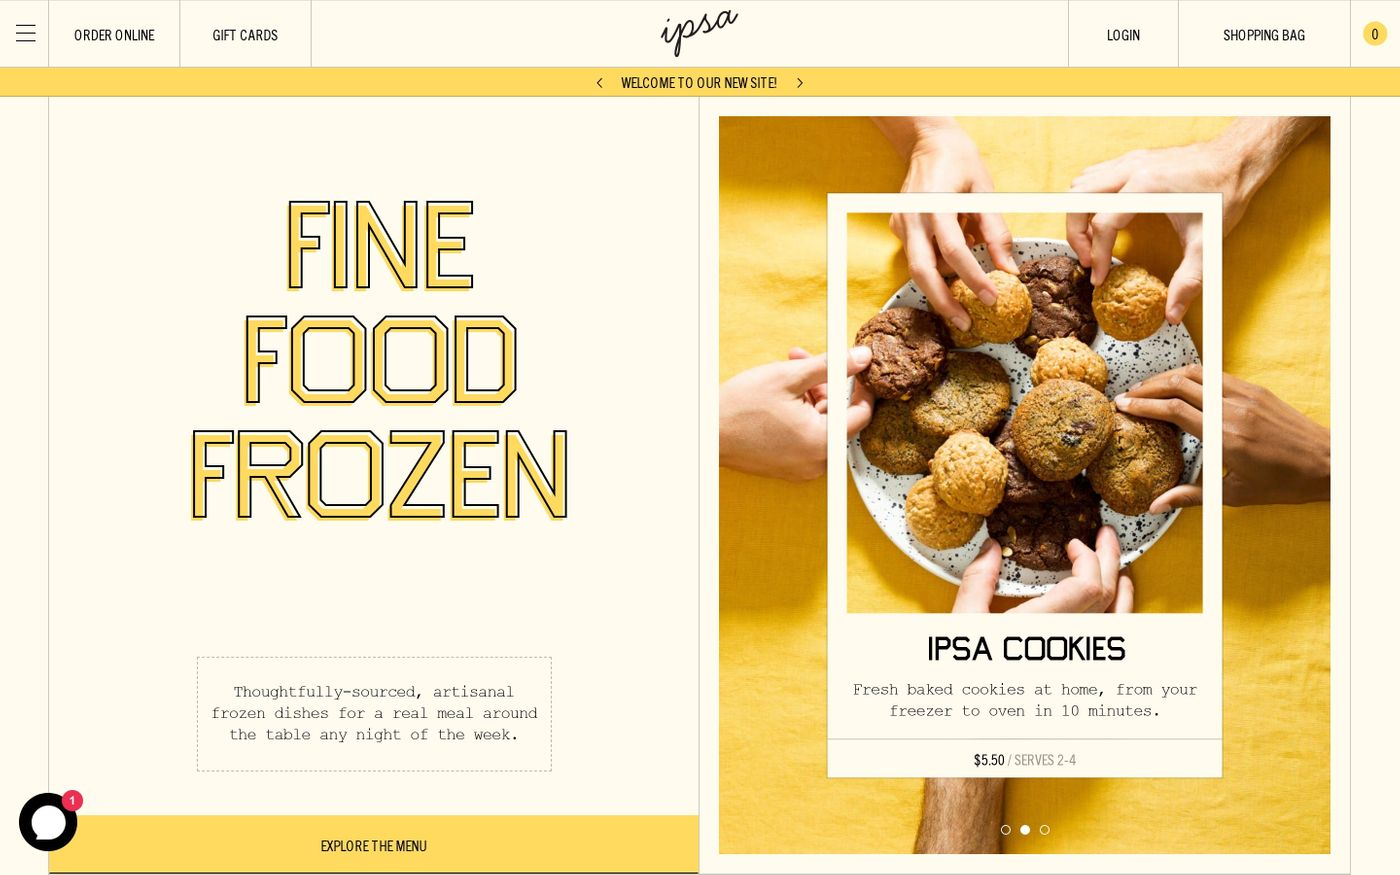 Screenshot of Ipsa provisions website